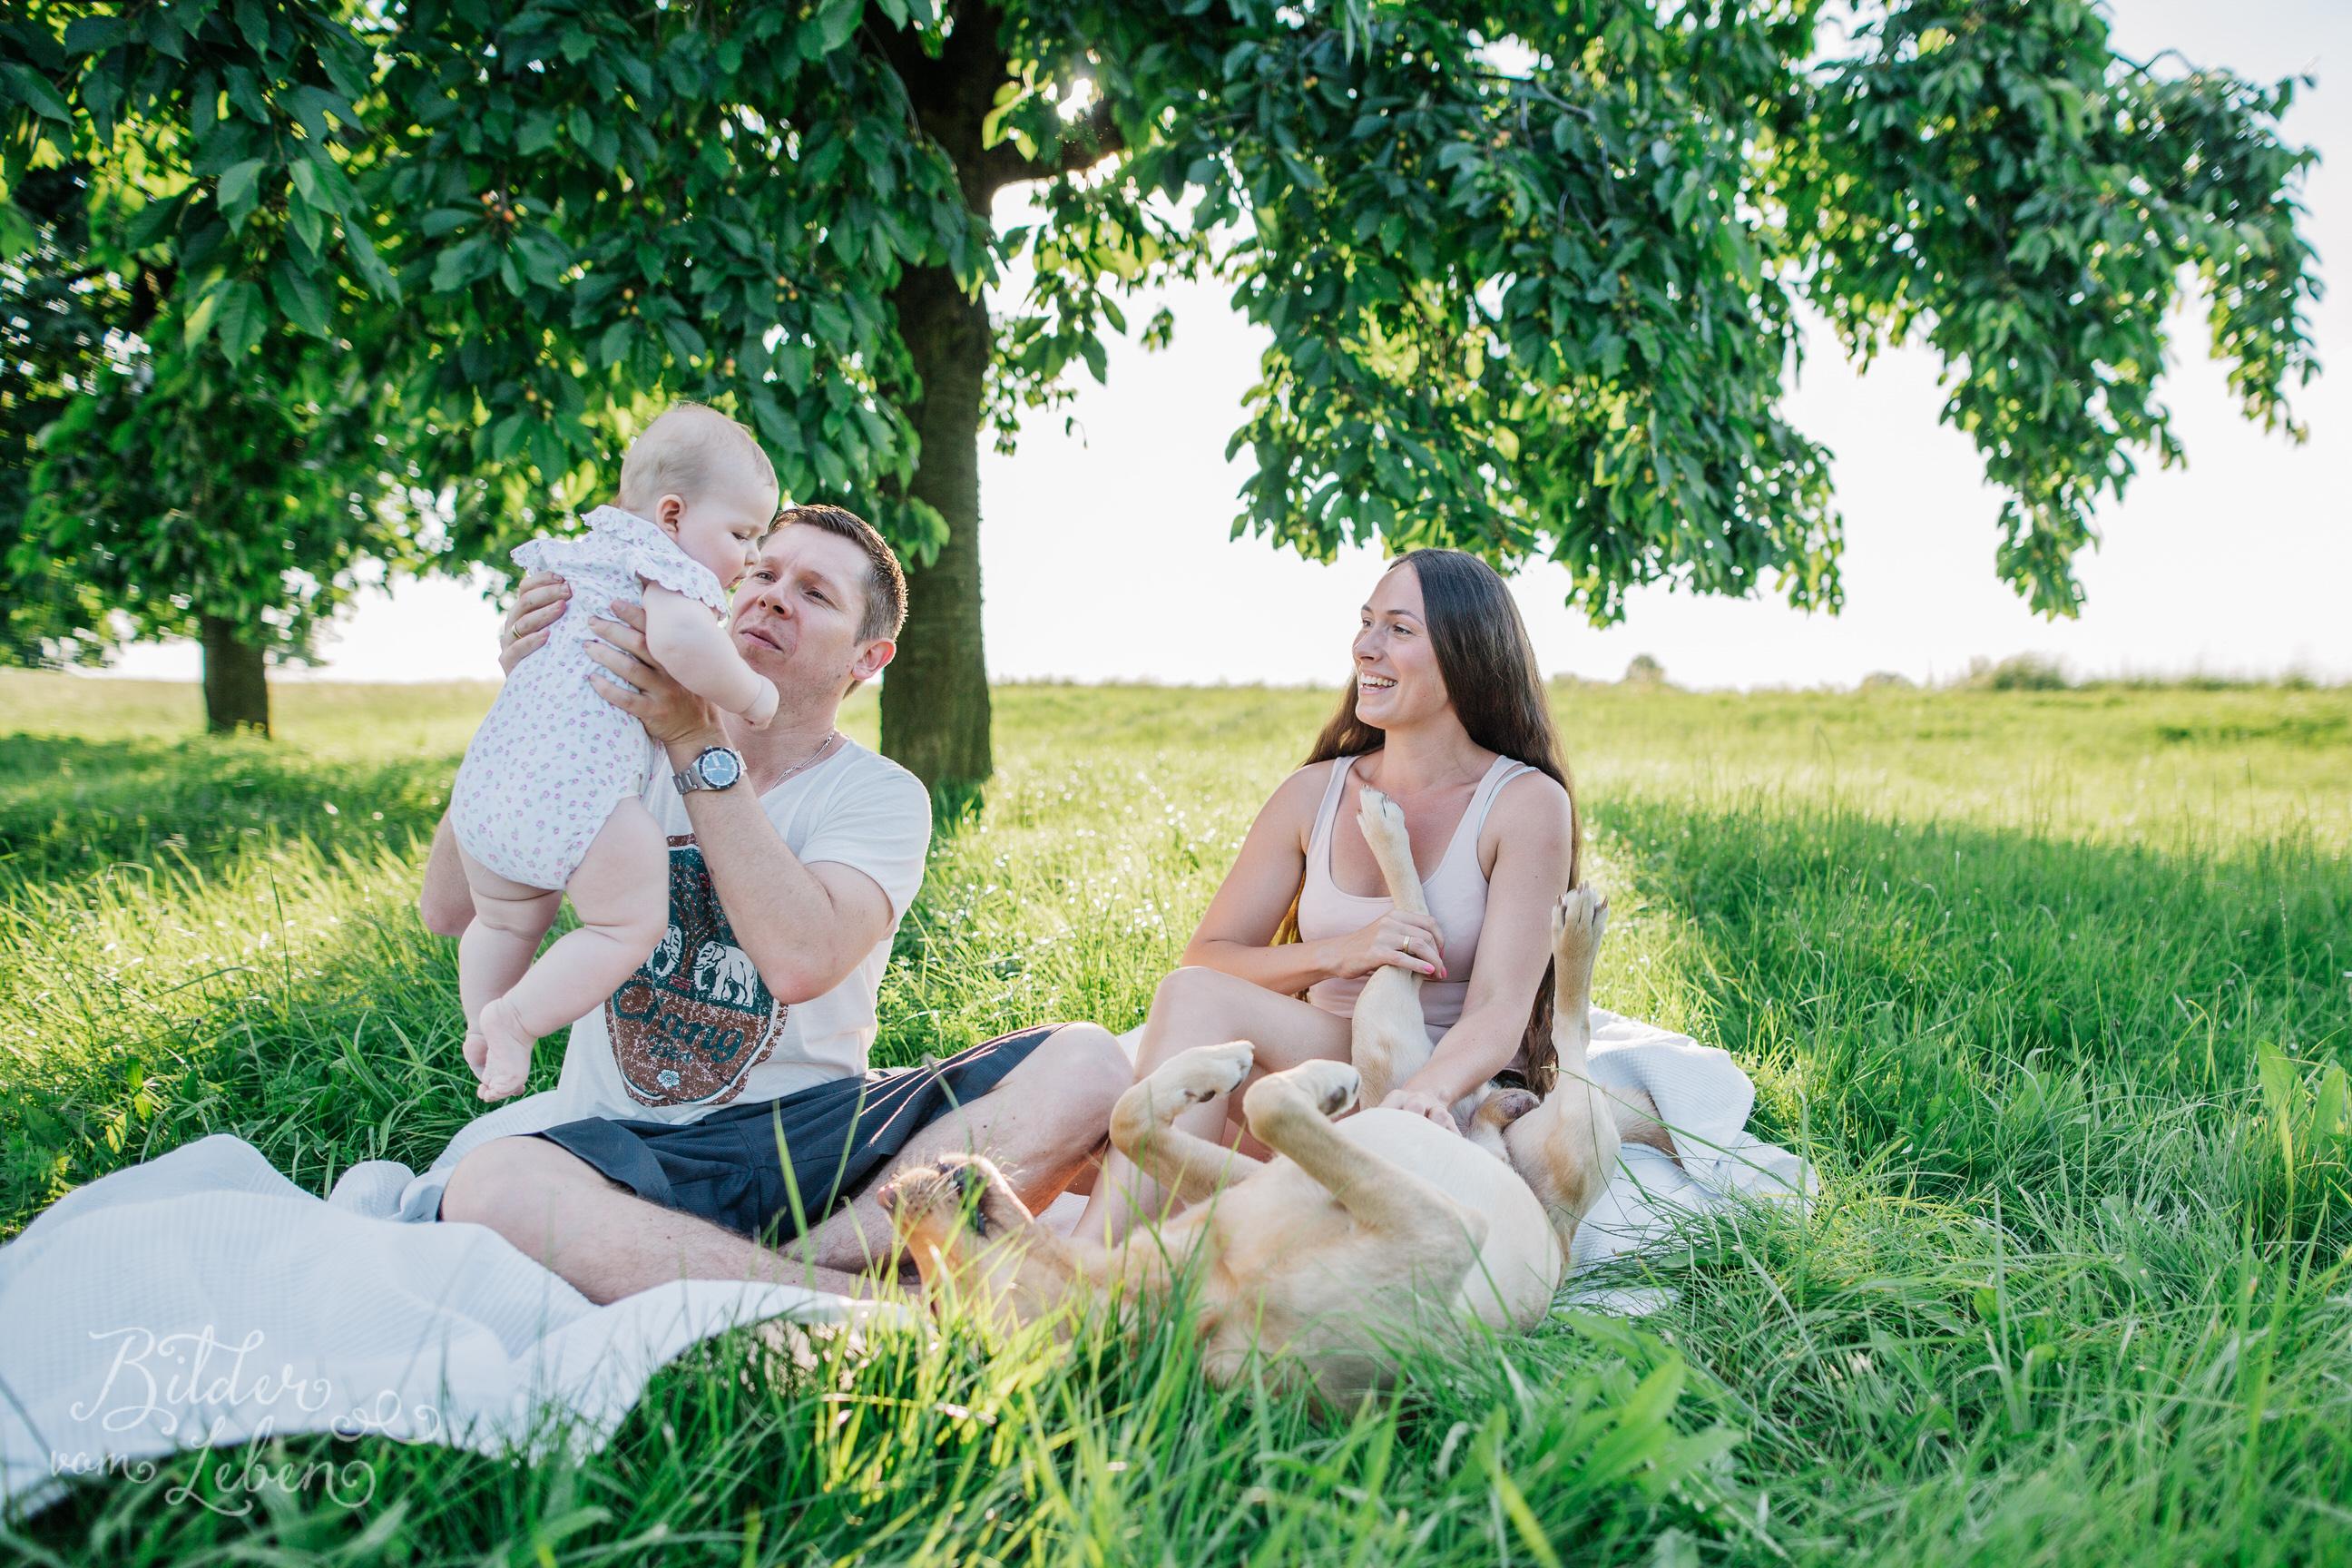 Greta-Labrador-Kinder-Portraits-BildervomLeben-2016-8029